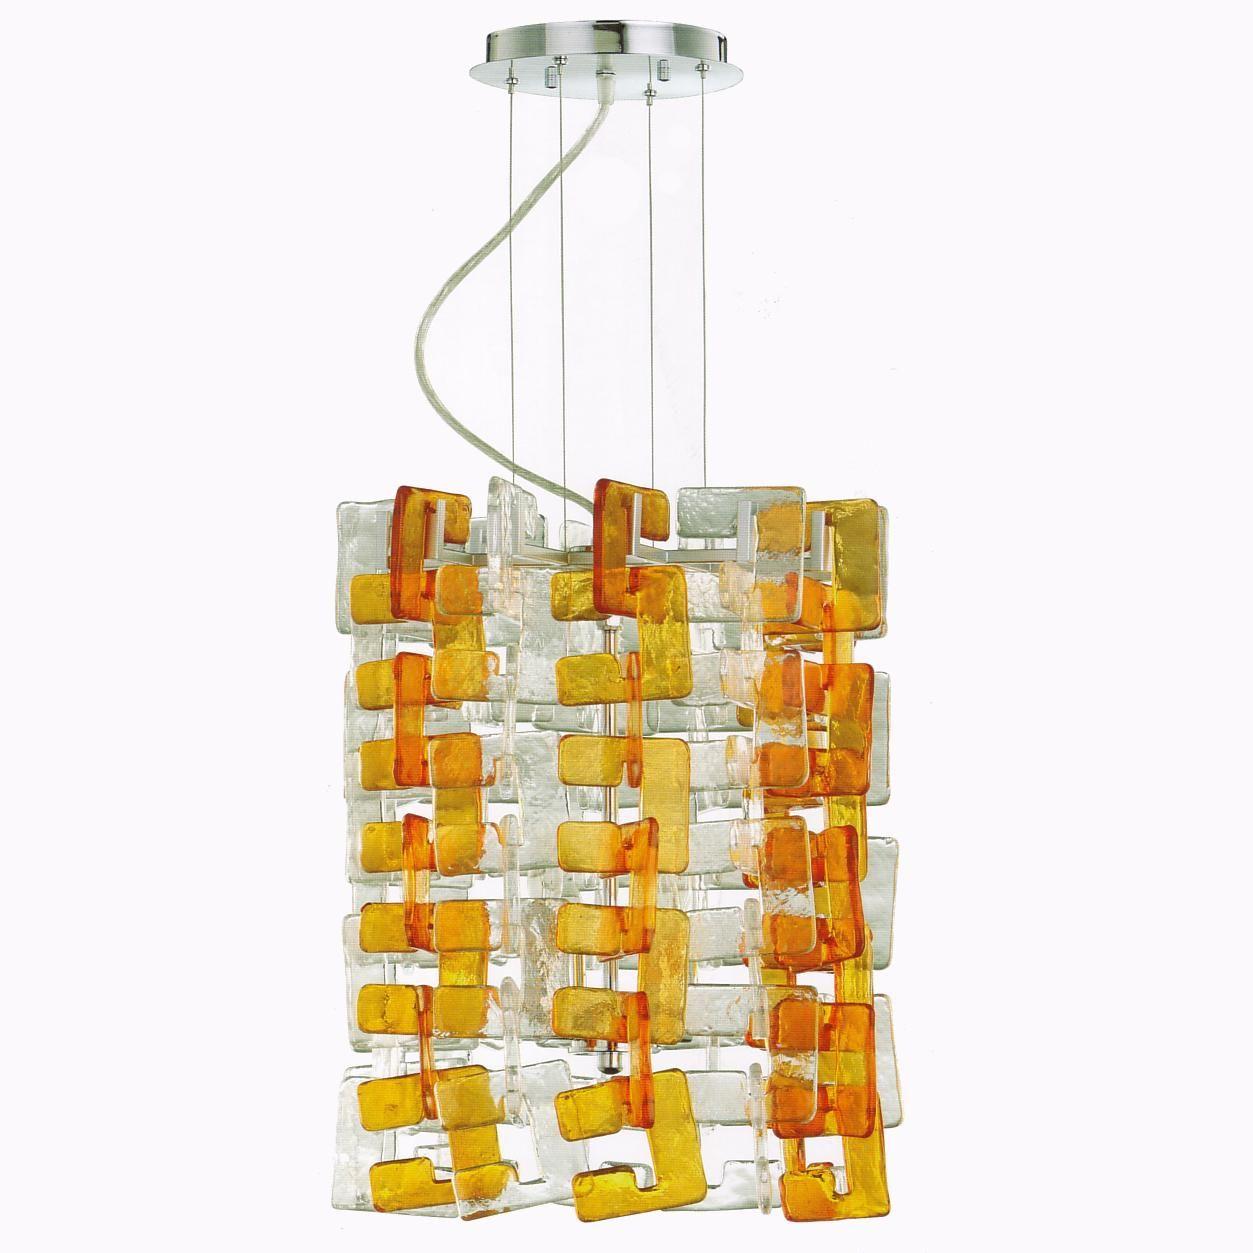 Havilland 4 Light Pendant by Cyan Design shown with (optional) Orange Murano Glass Link Extension Sets. #Shopcandelabra #RetroWave